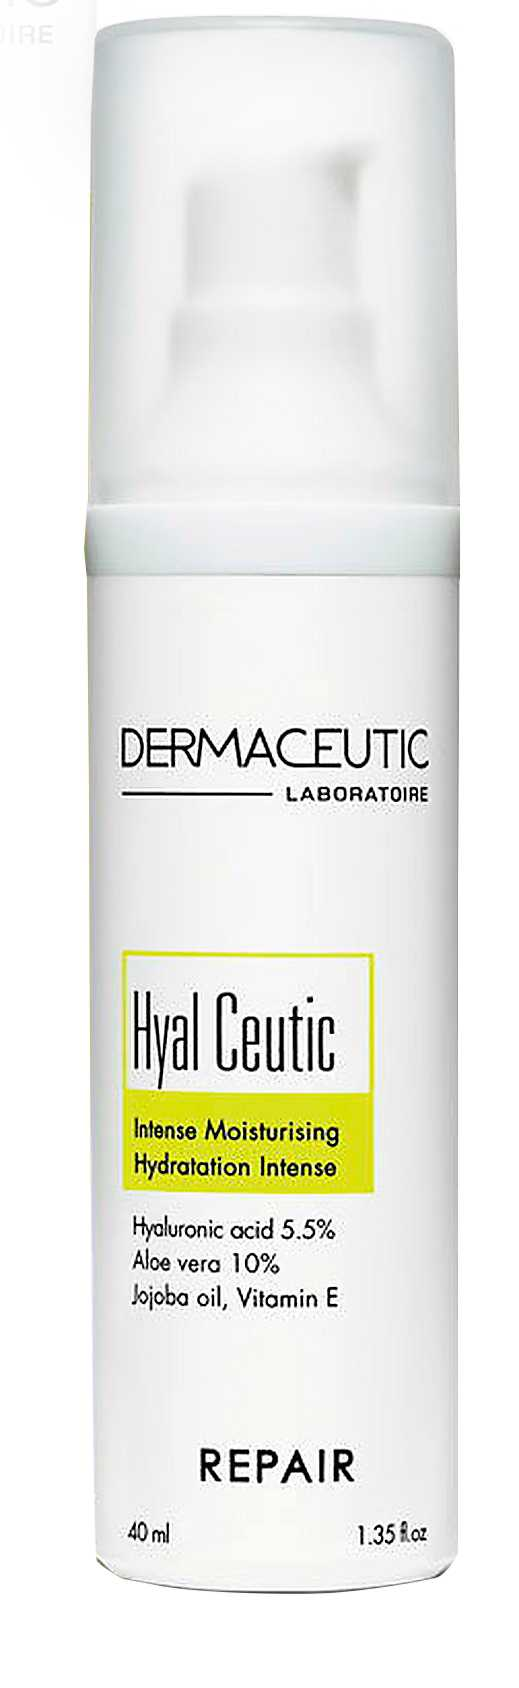 """Hyal ceutic"", Dermaceutic, 549 kronor."